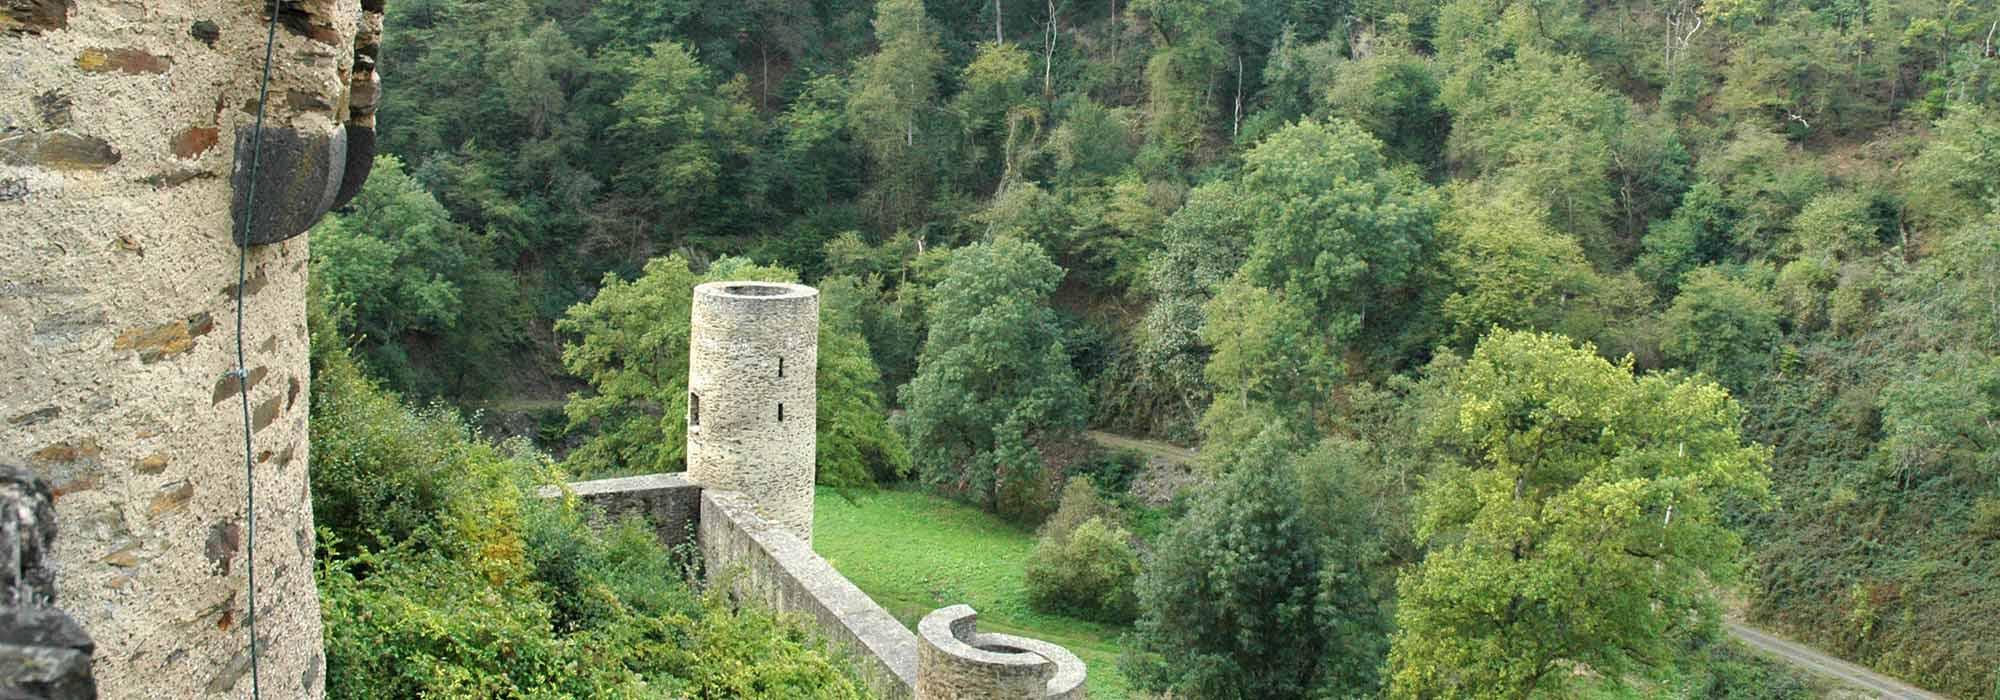 Elzbach-DSC_4959